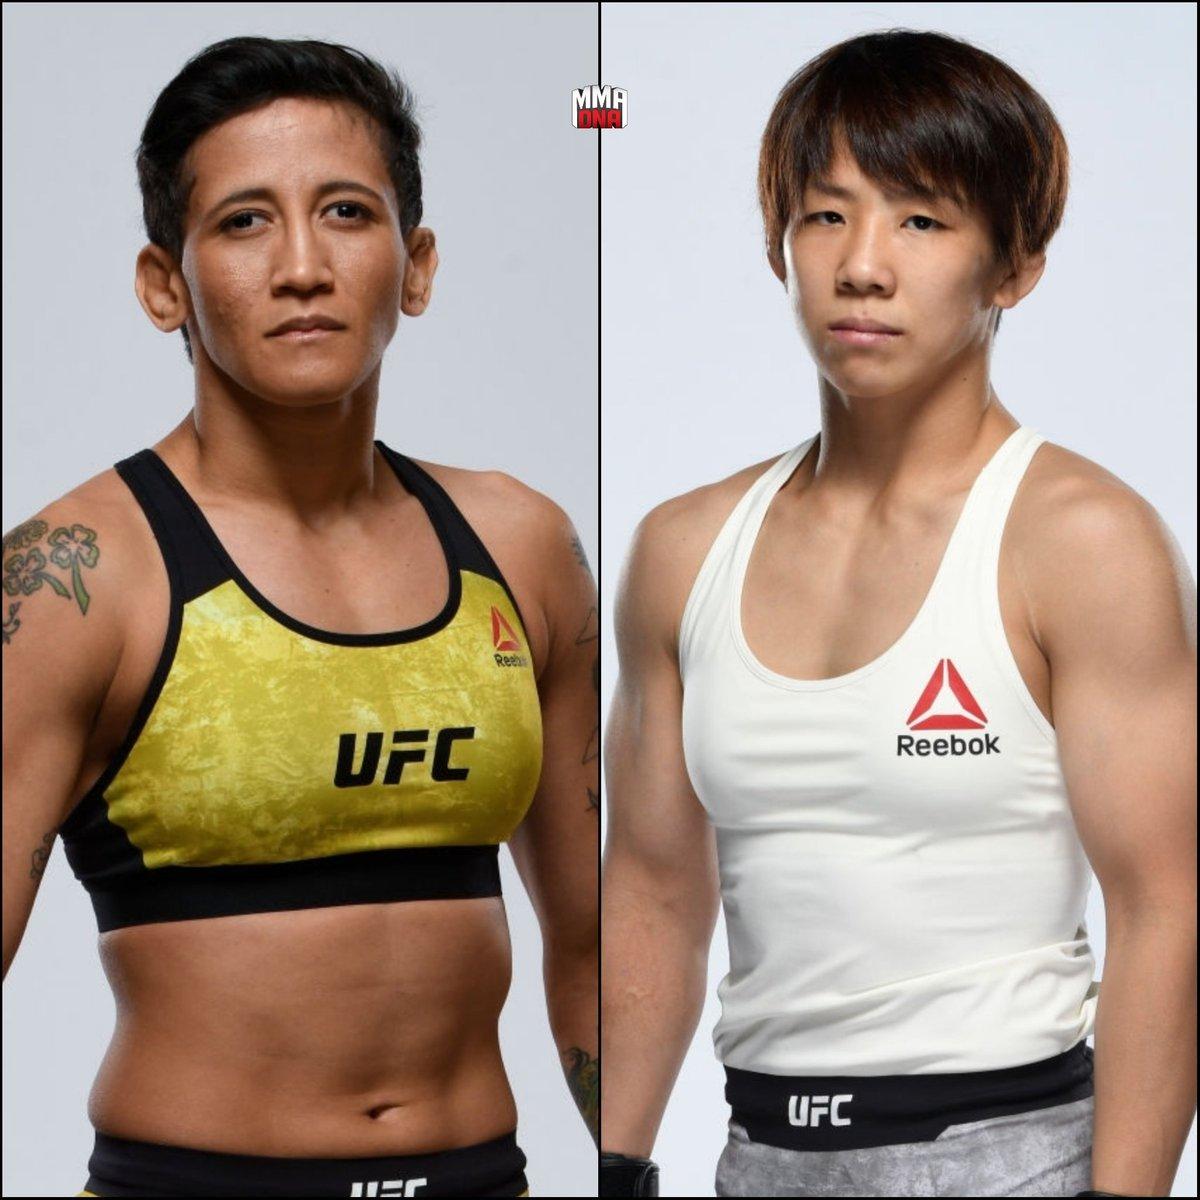 Virna Jandiroba will fight Kanako Murata at UFC event on June 19th. (per @marbarone) #UFC #MMA #UFCESPN